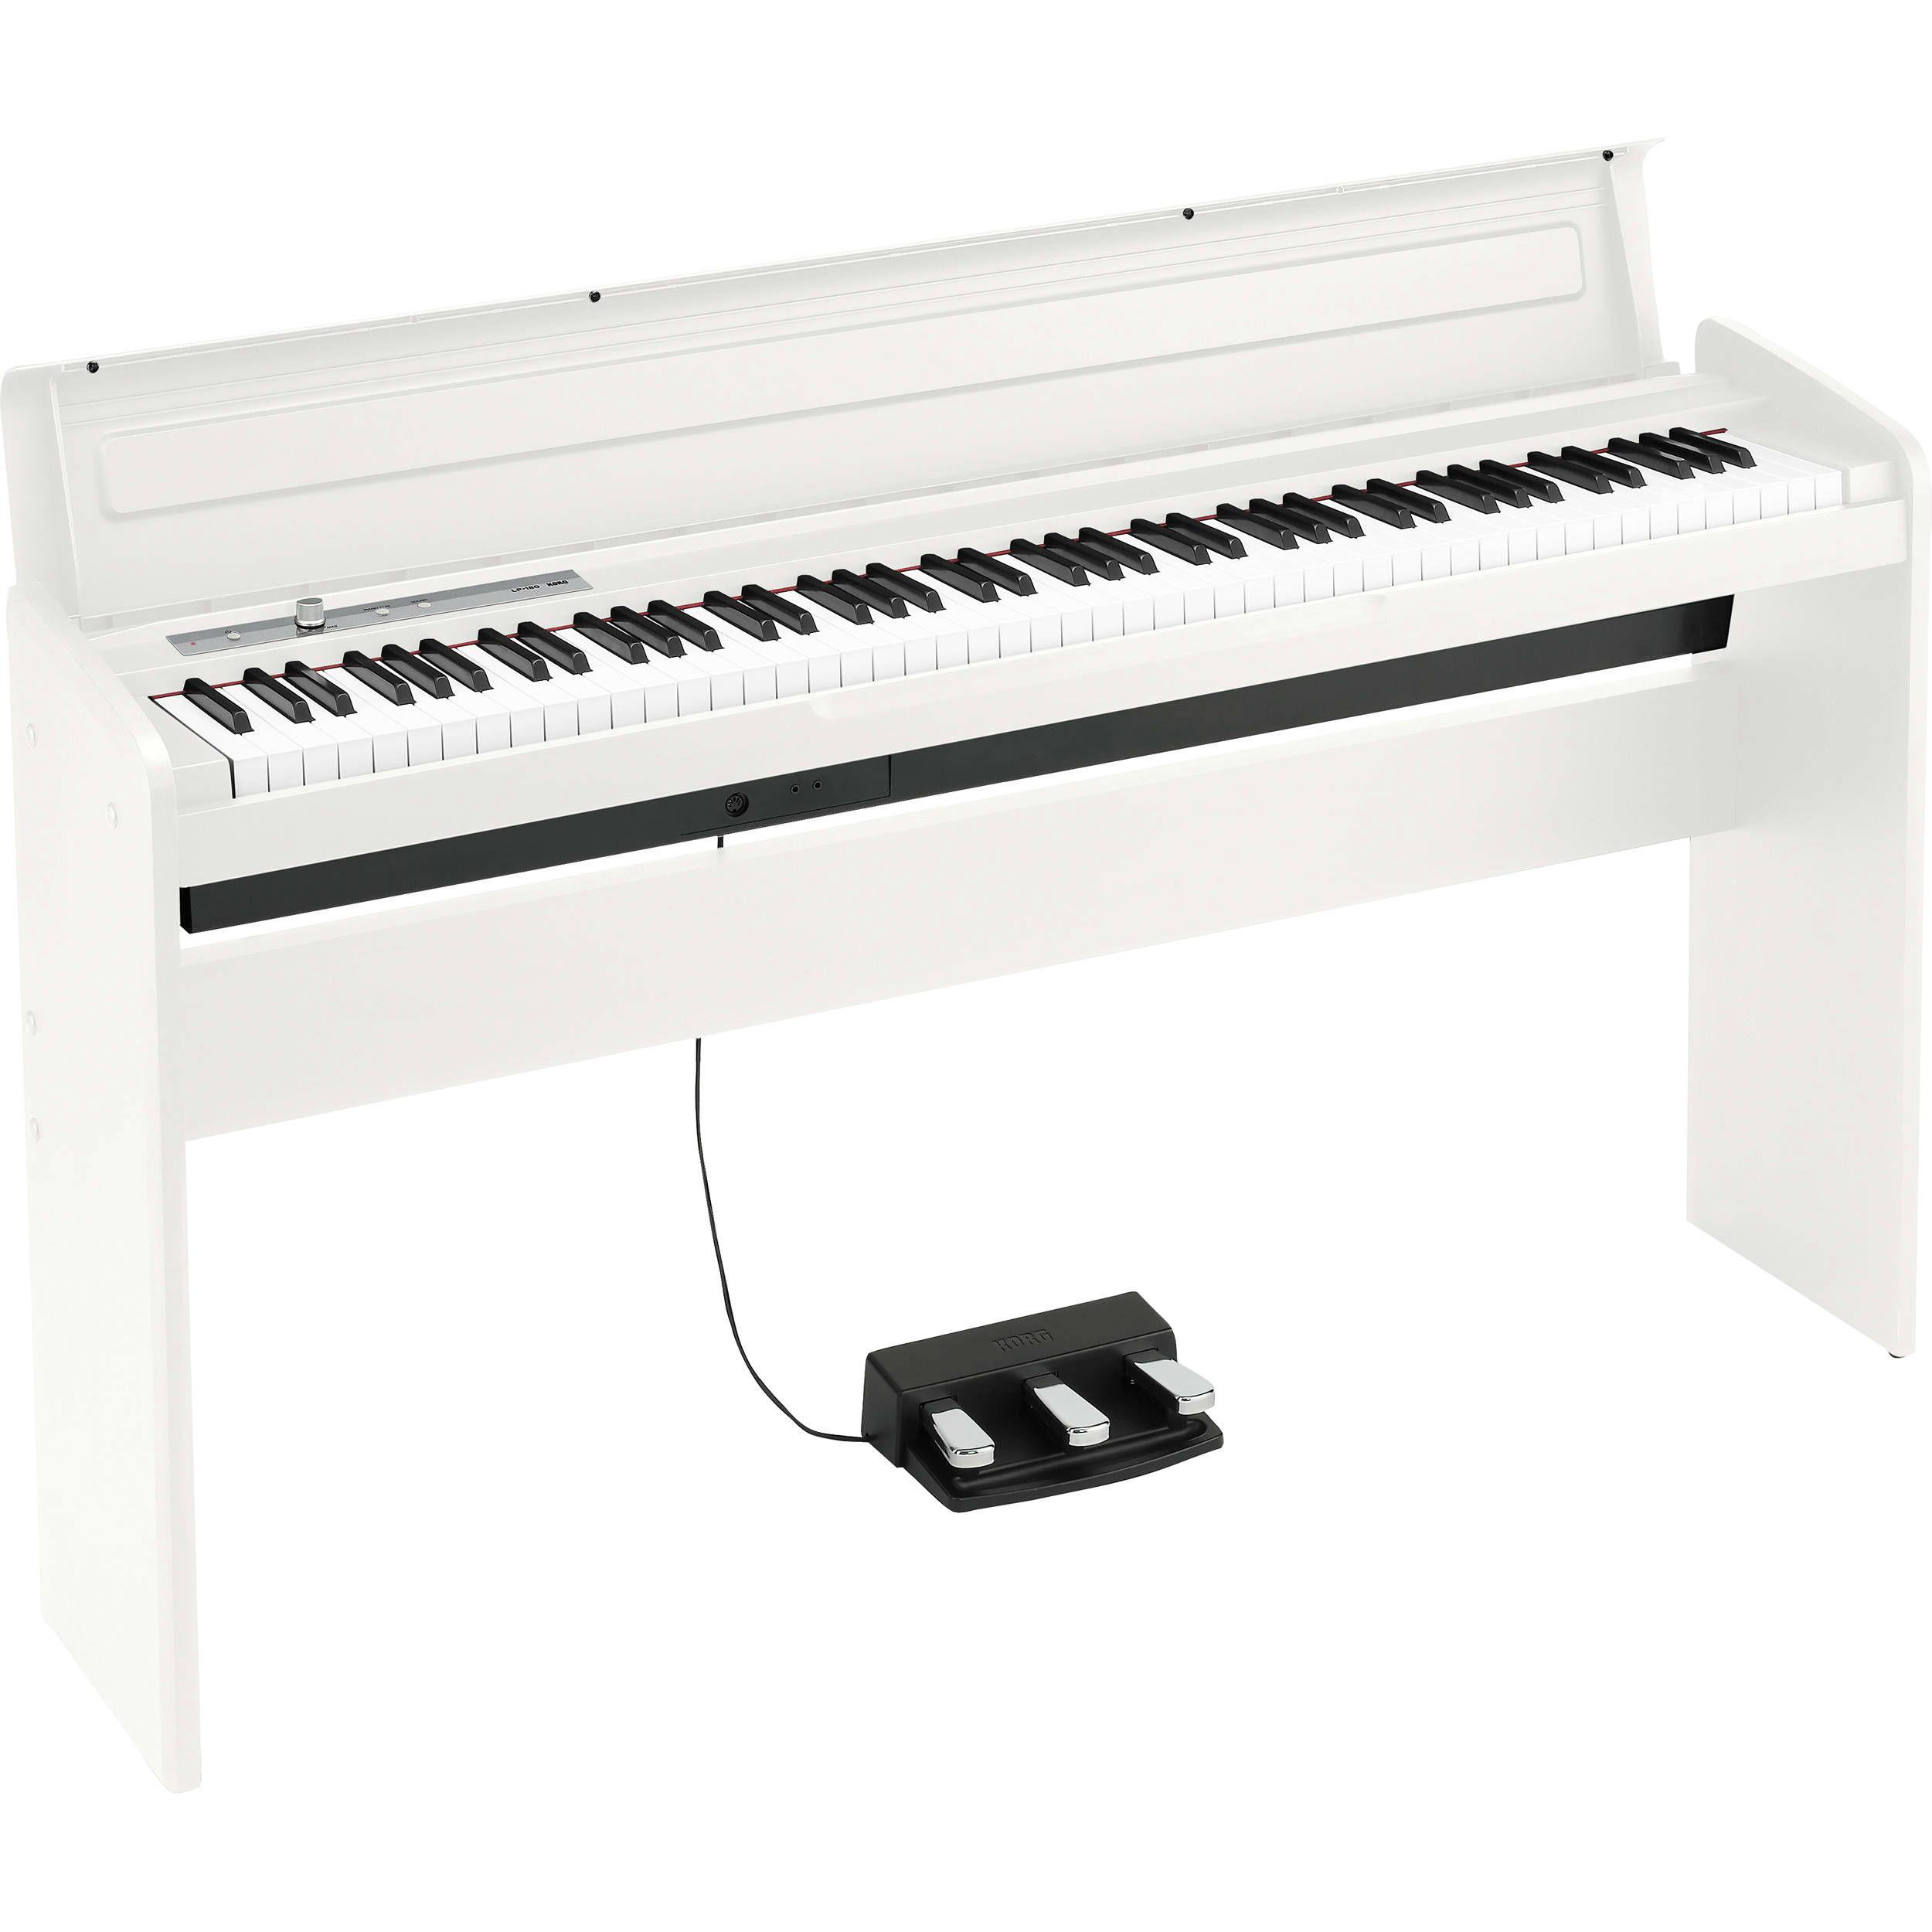 Korg LP-180 Digital Piano - White